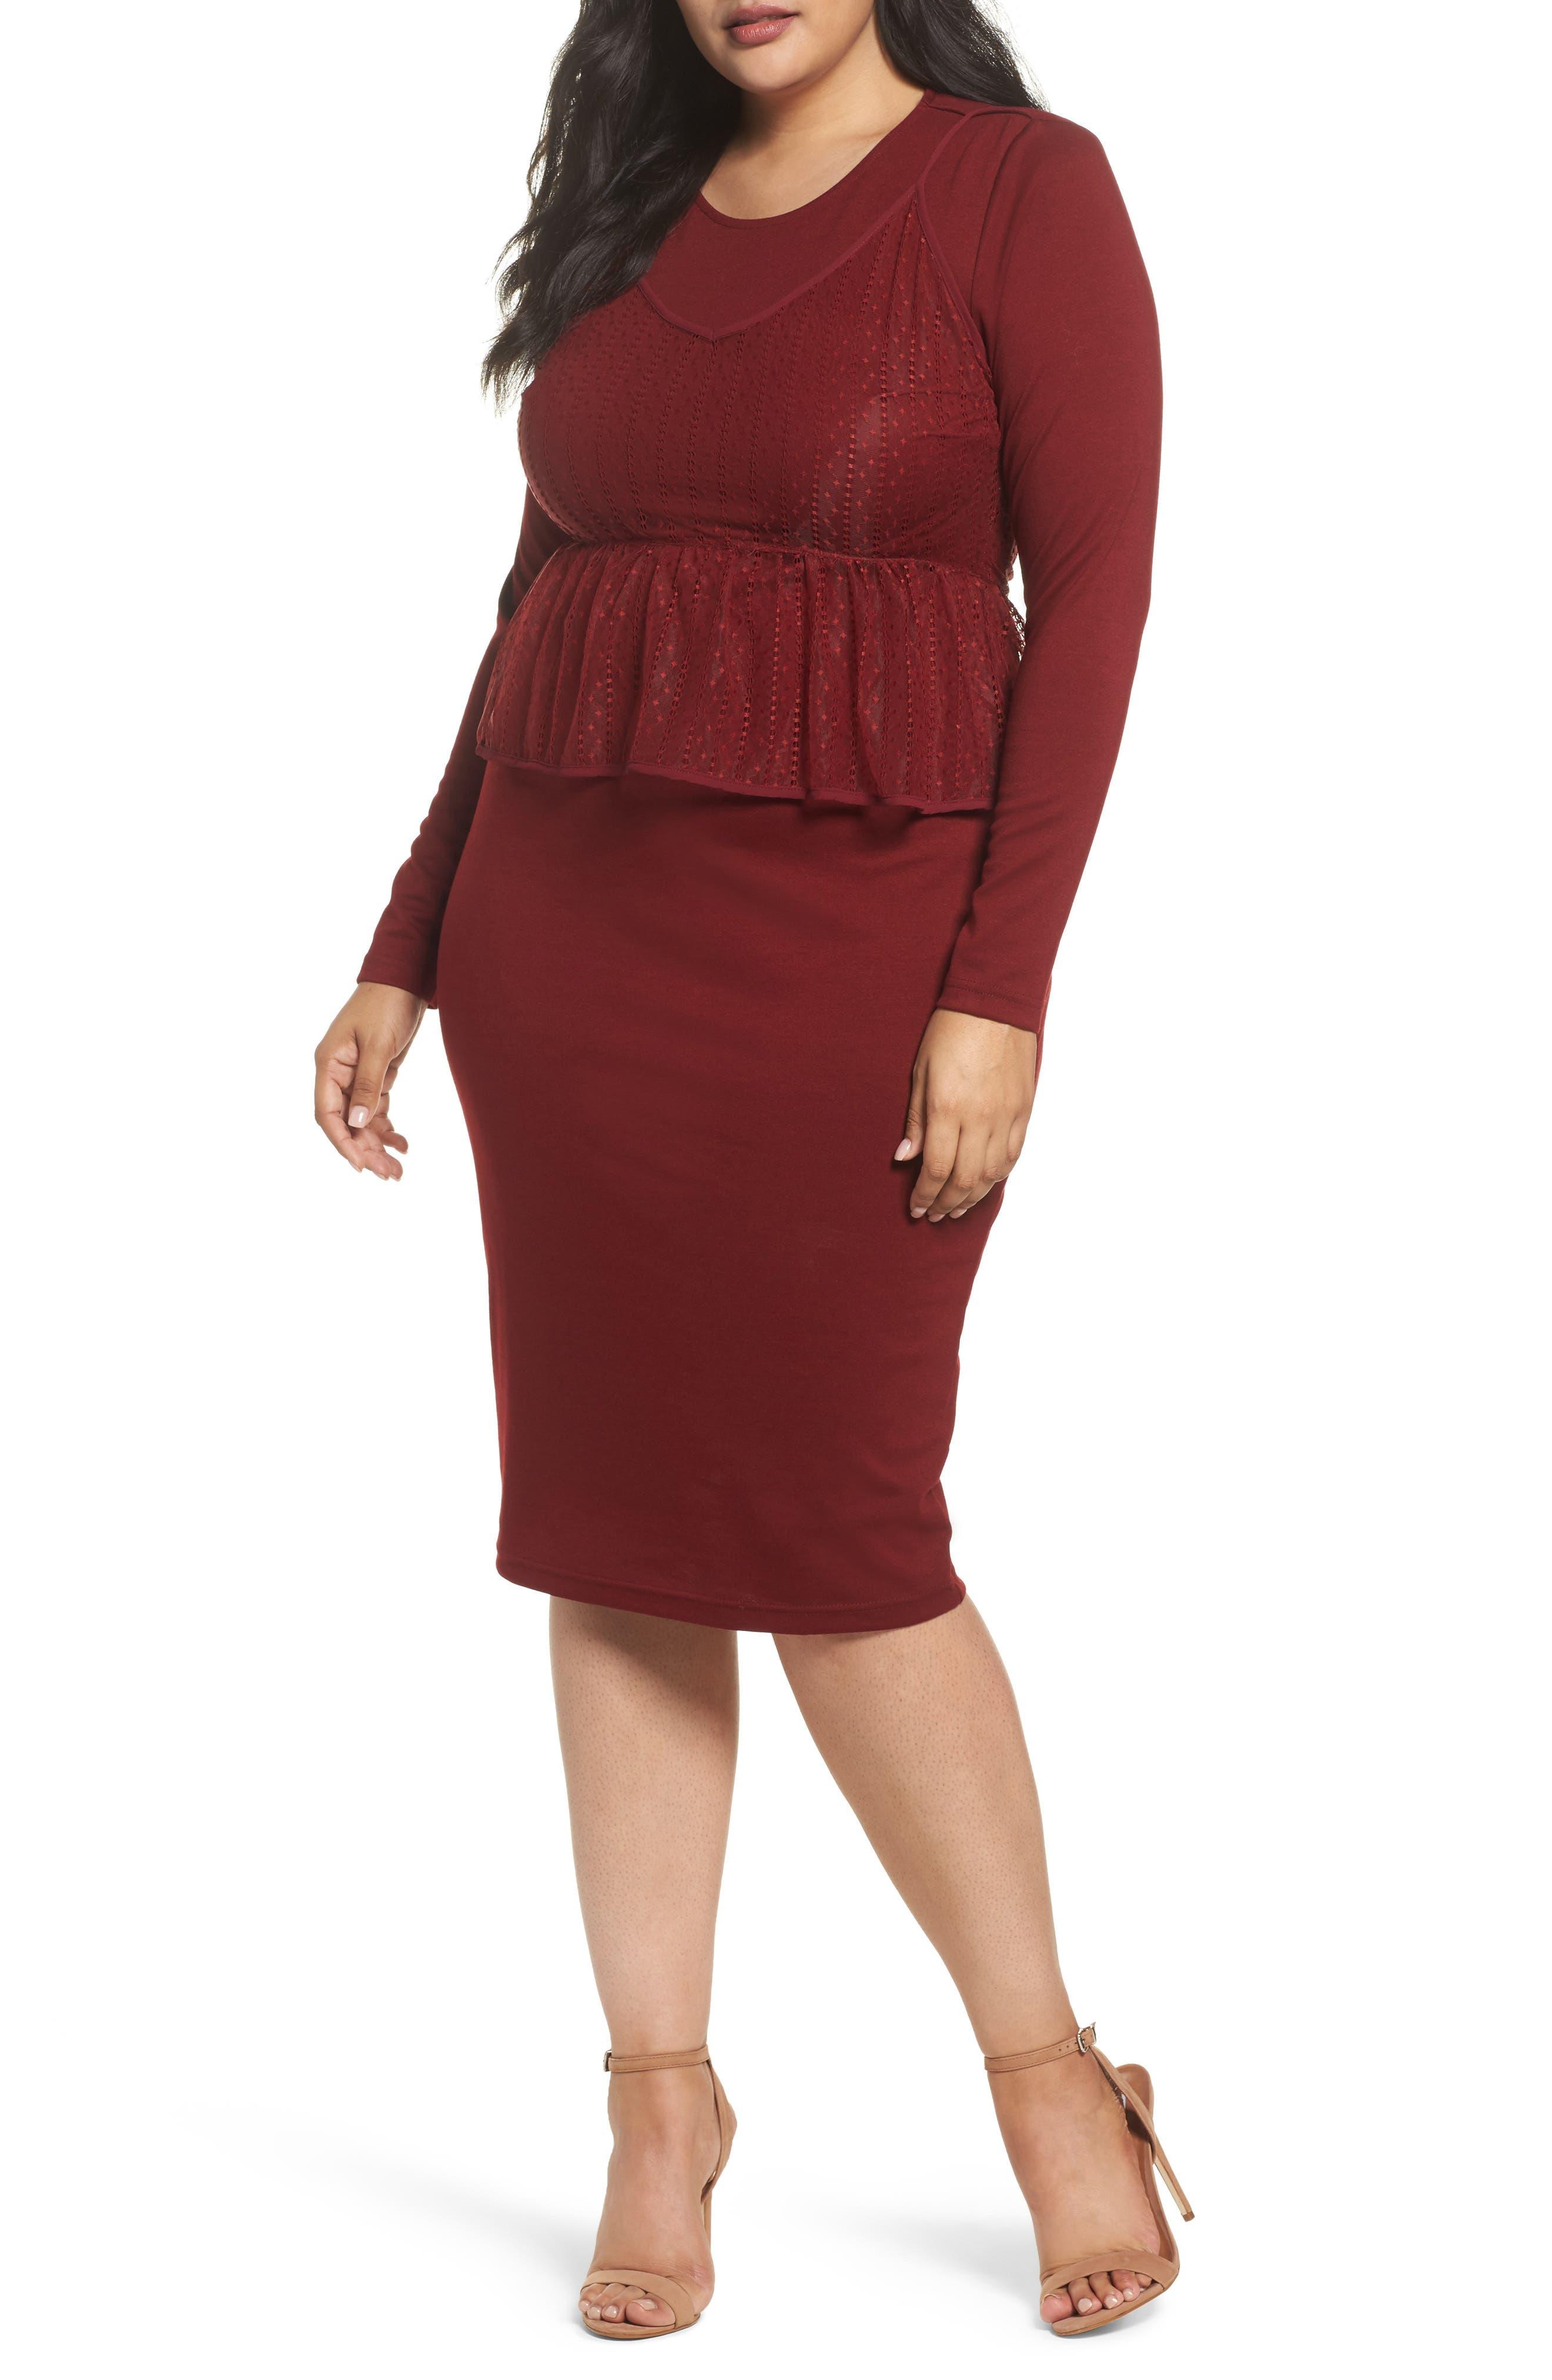 Main Image - LOST INK Peplum Overlay Body-Con Dress (Plus Size)